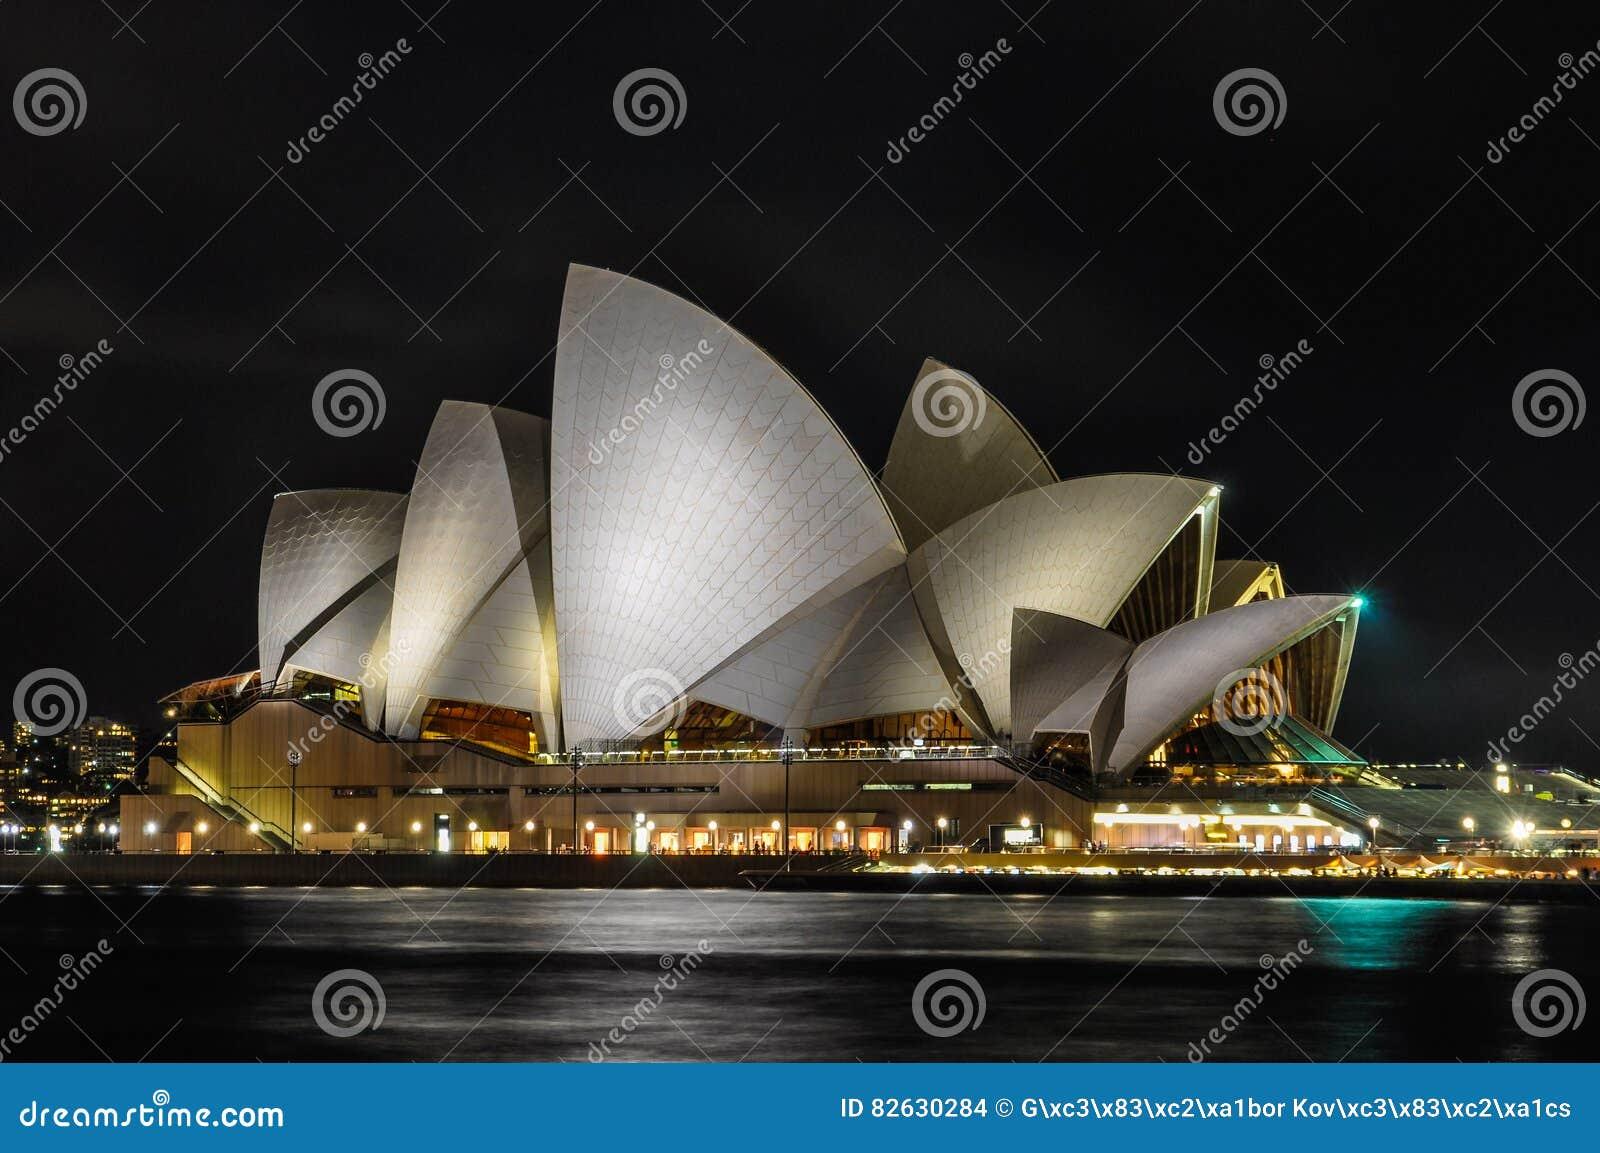 Sexy date night in Sydney